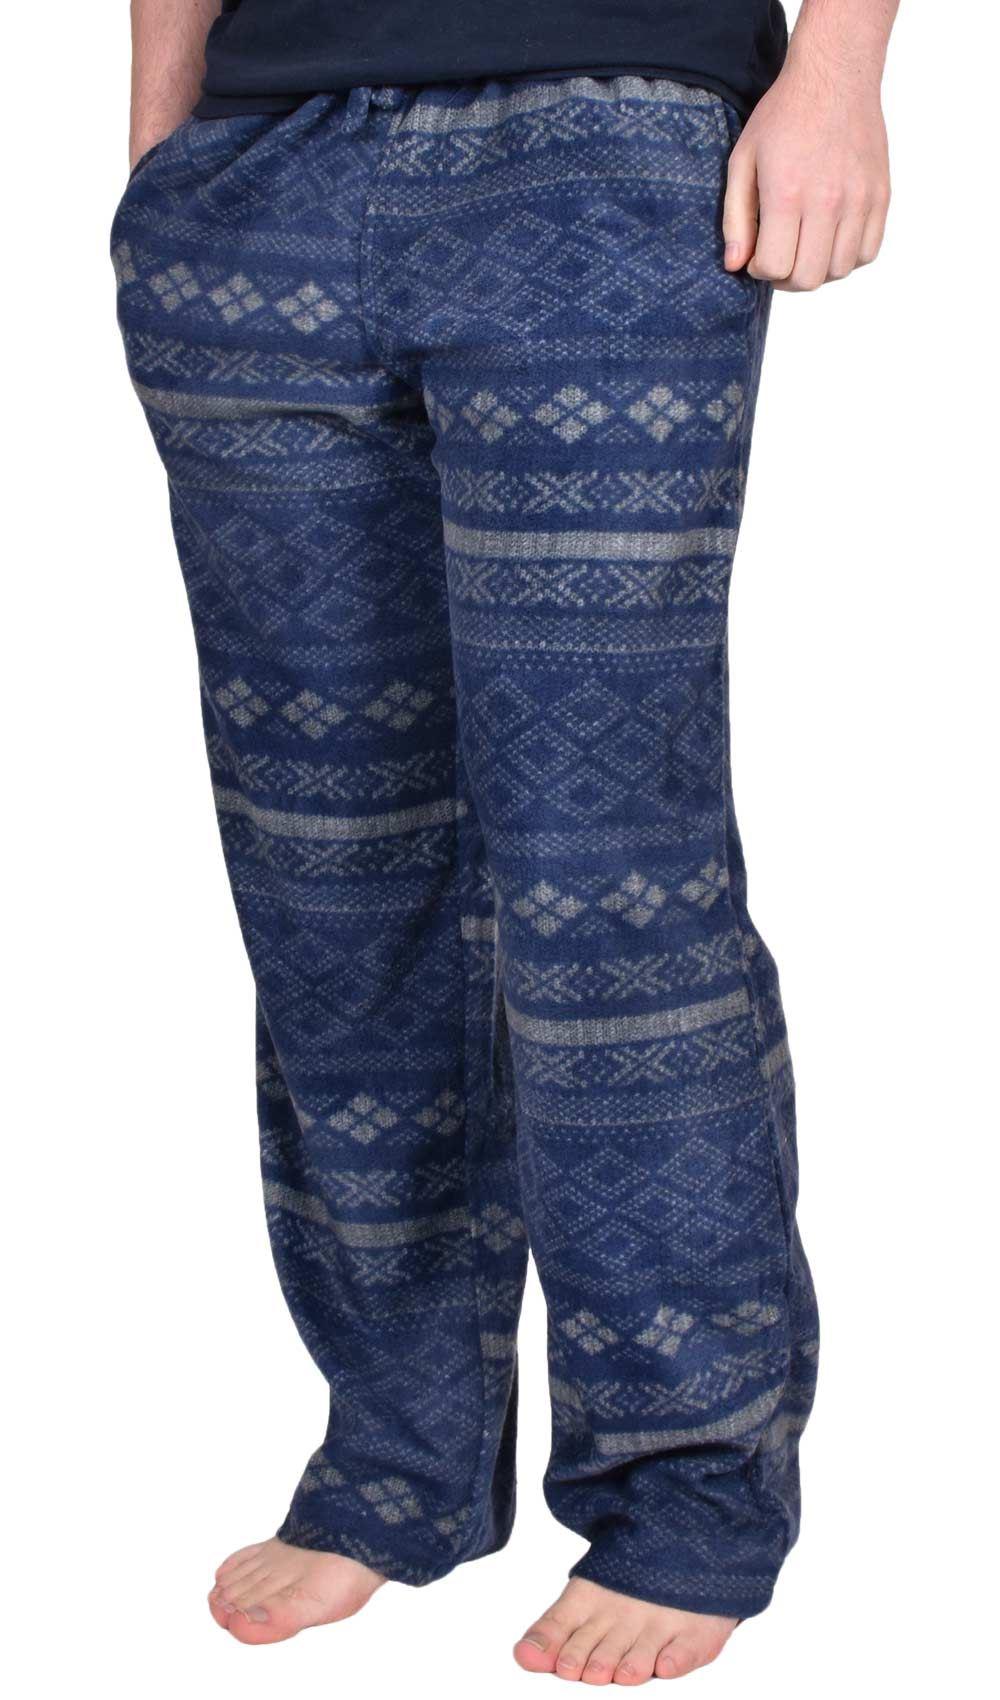 Mens-Women-Plain-Fleece-Joggers-Bottoms-Jogging-Pant-Gym-Fitness-Sports-Trousers thumbnail 12